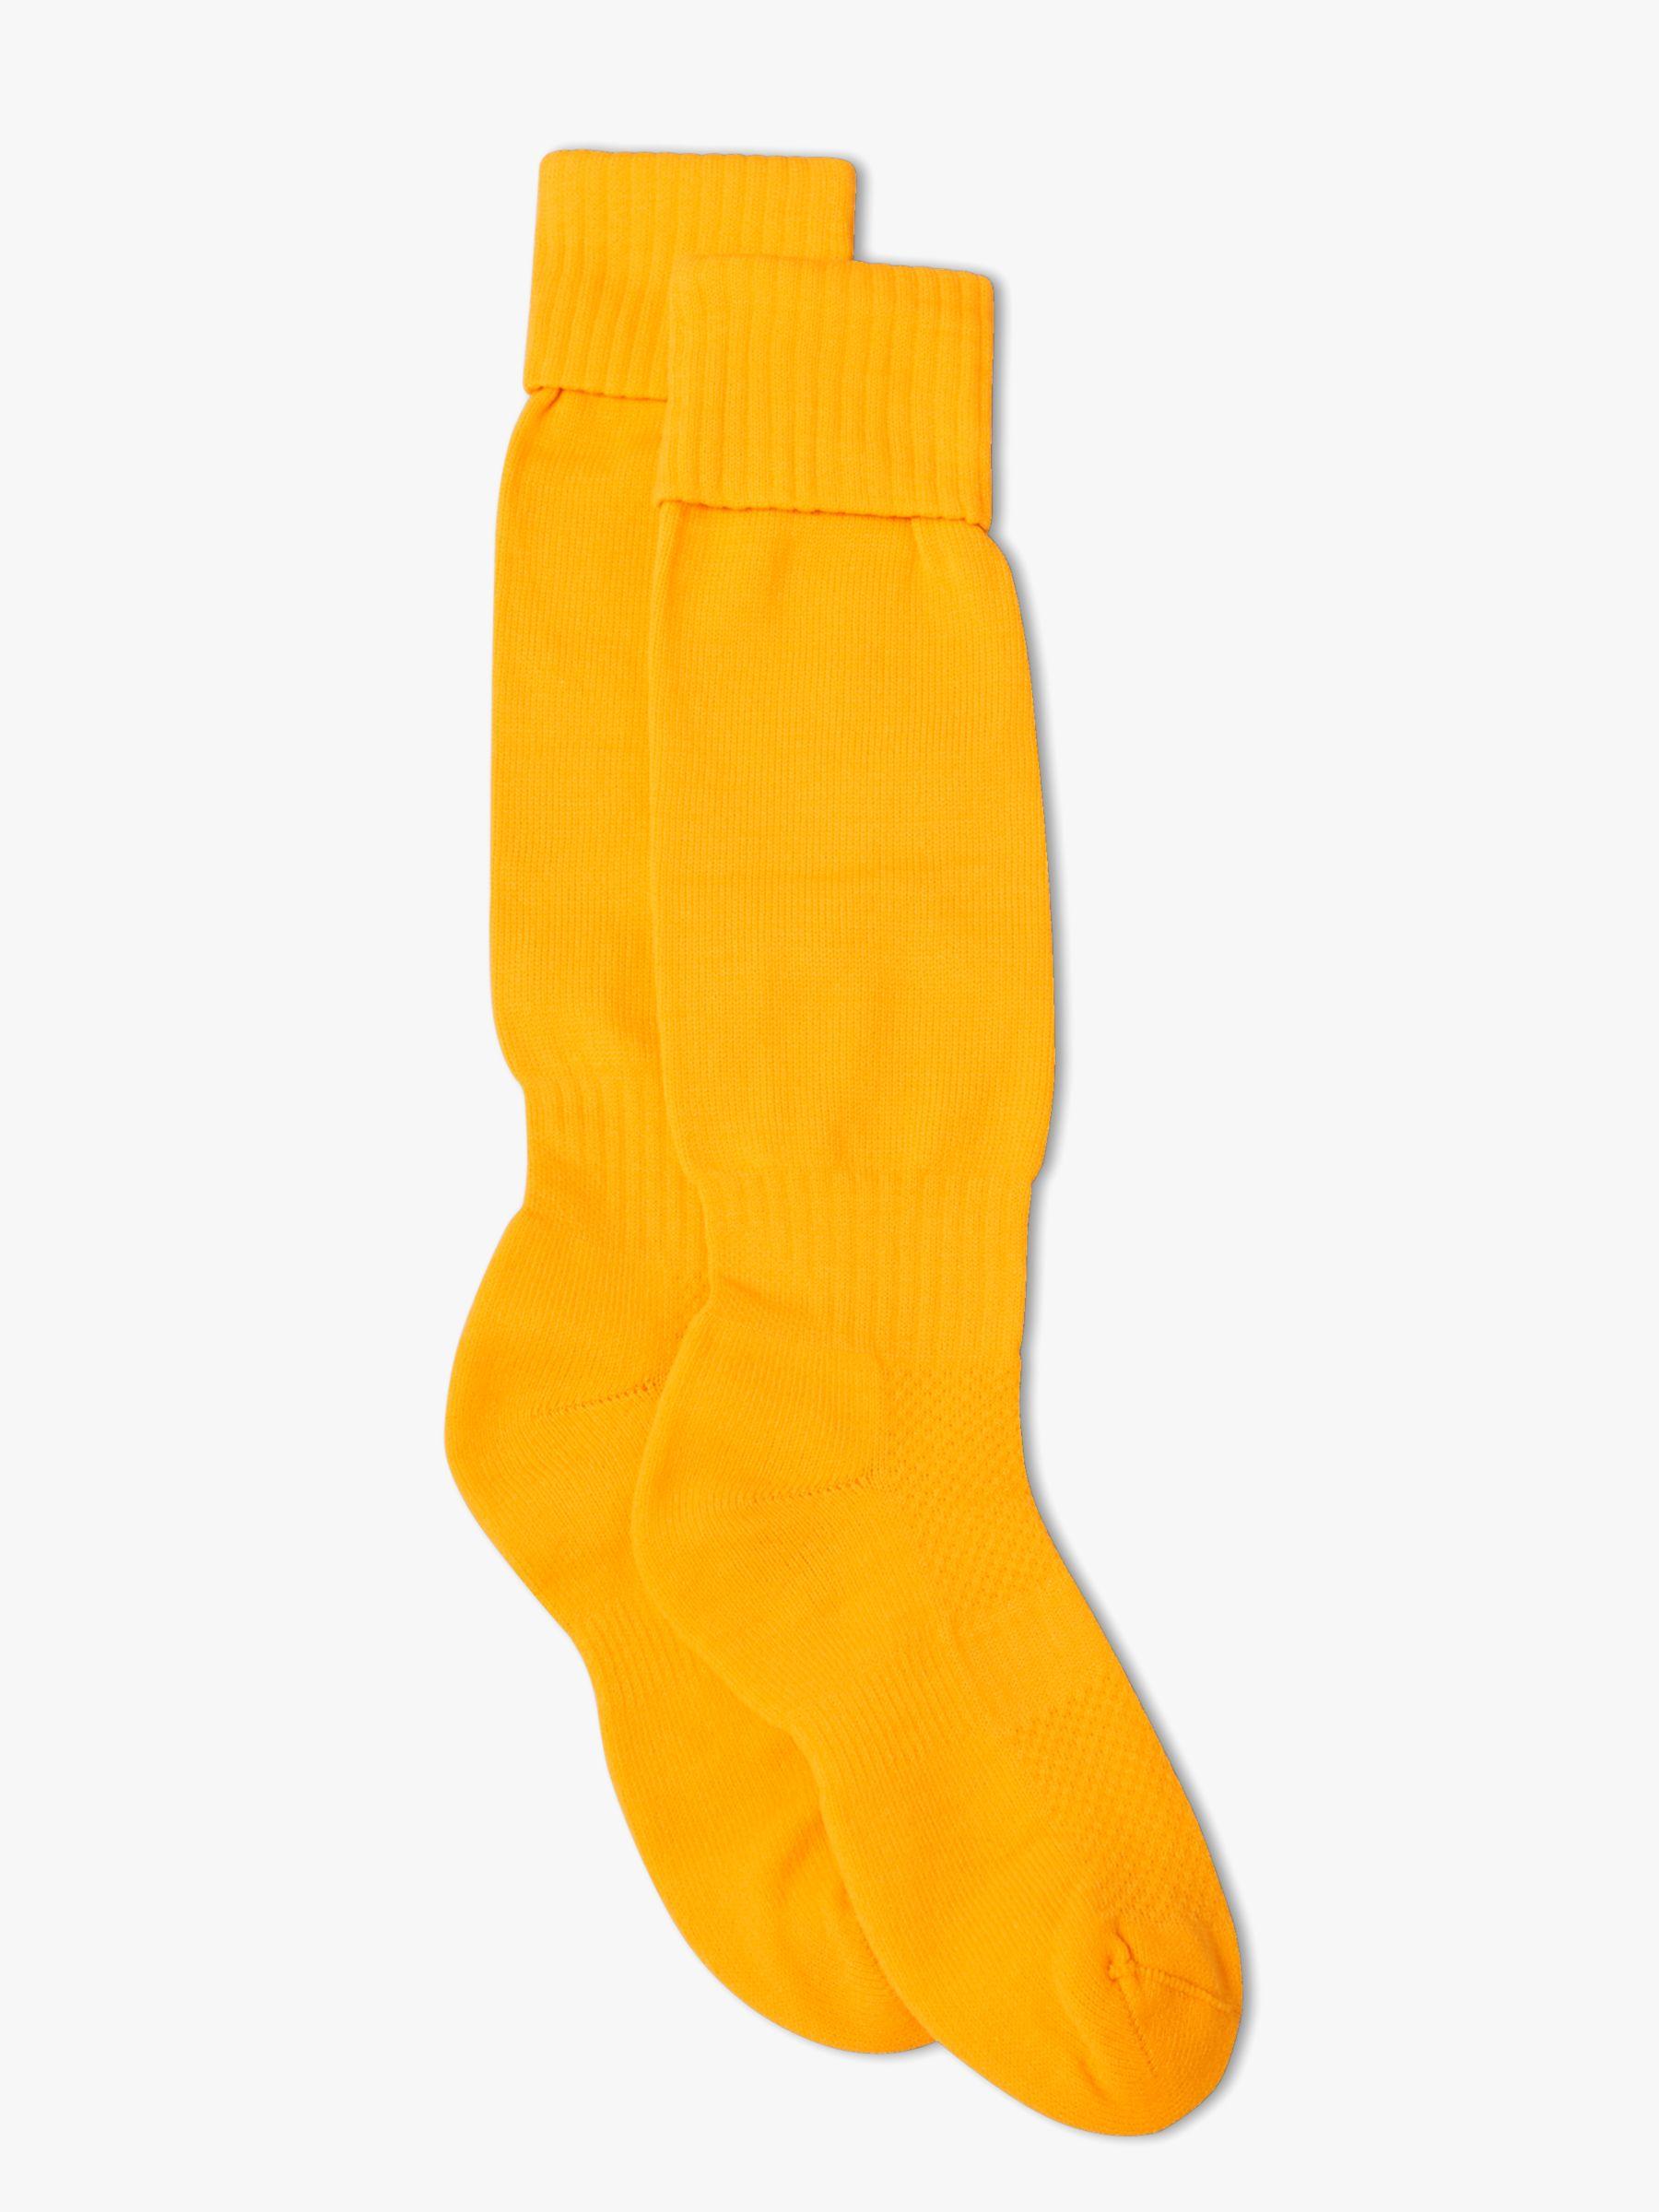 Falcon Unisex Games Socks, Amber